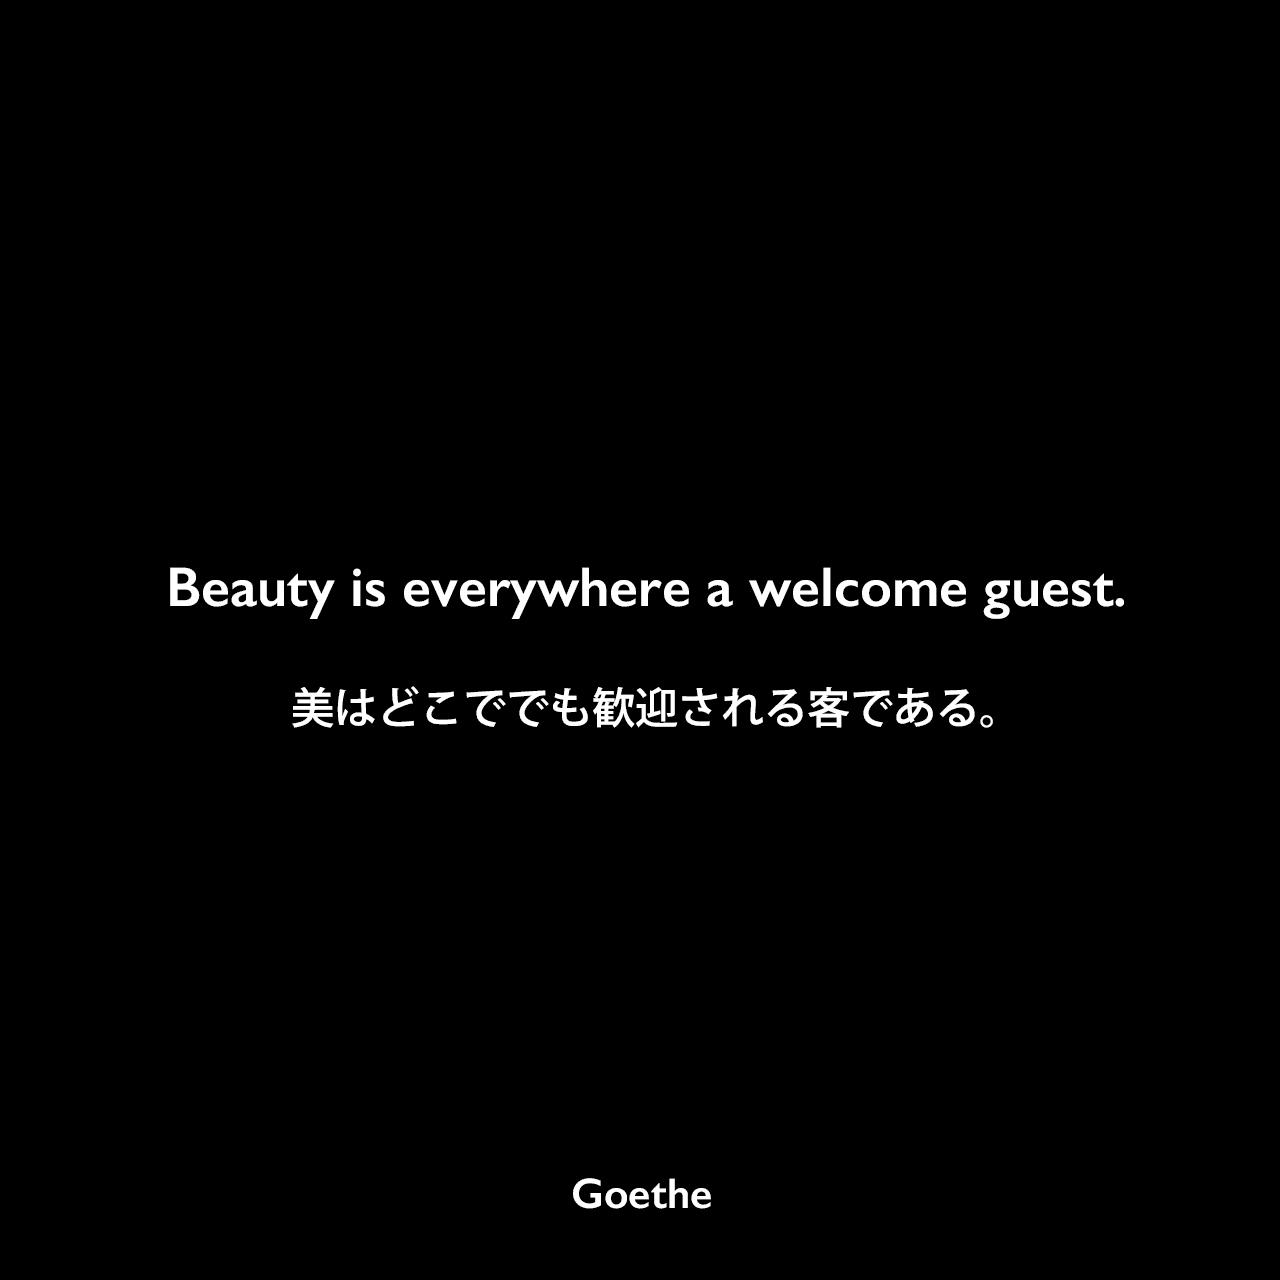 Beauty is everywhere a welcome guest.美はどこででも歓迎される客である。Johann Wolfgang von Goethe